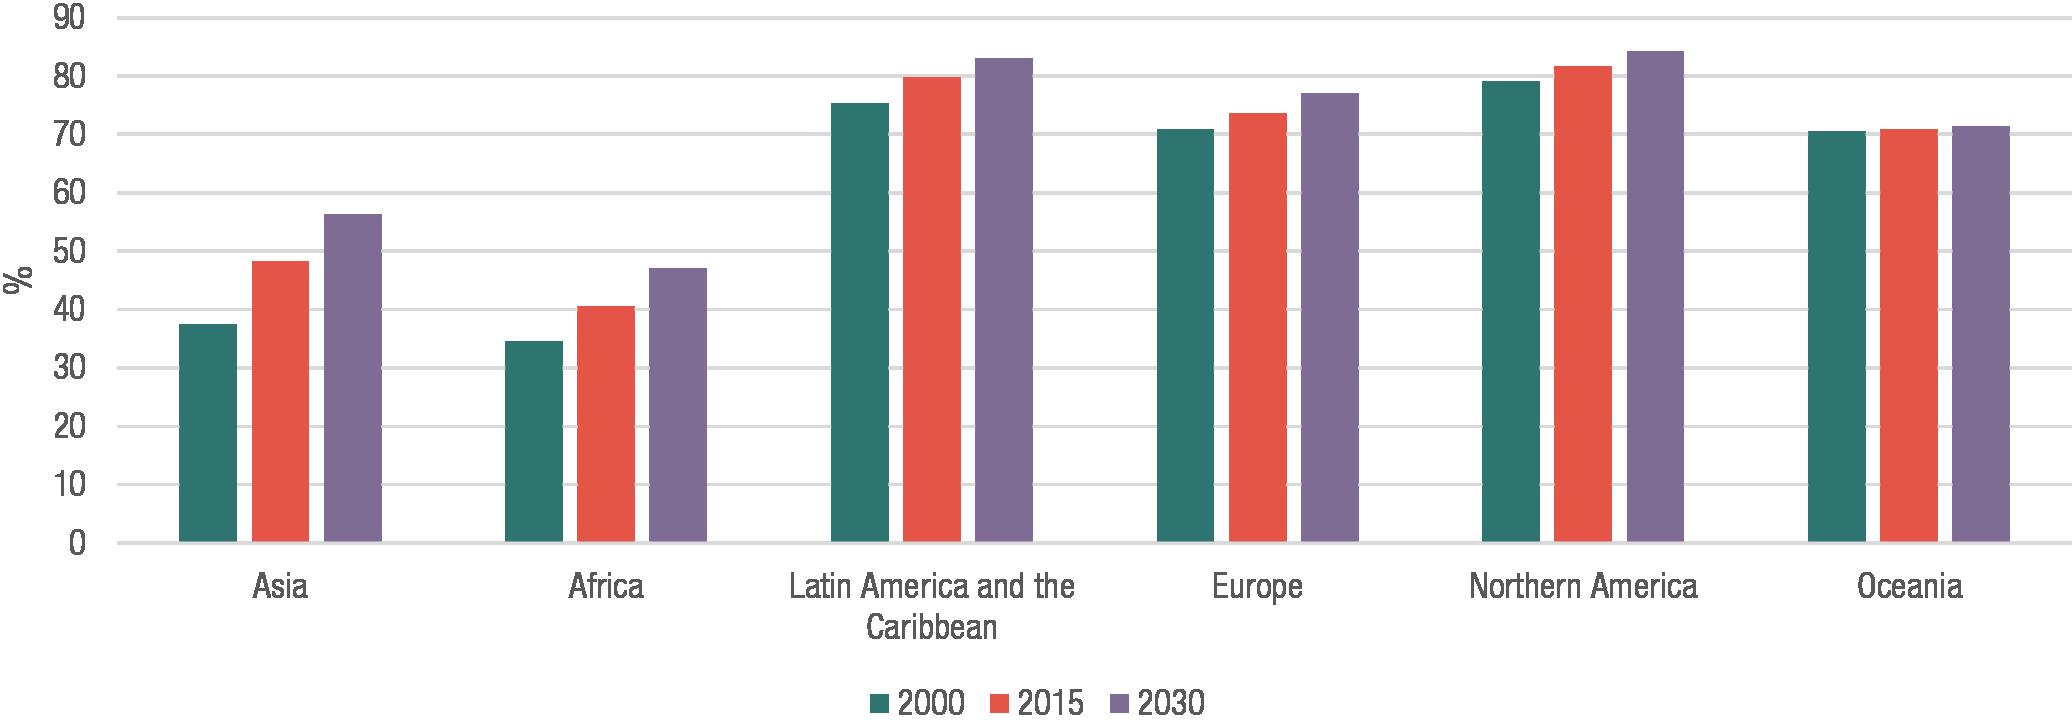 Figure 1: Percentage of population residing in urban areas, UN DESA 2014